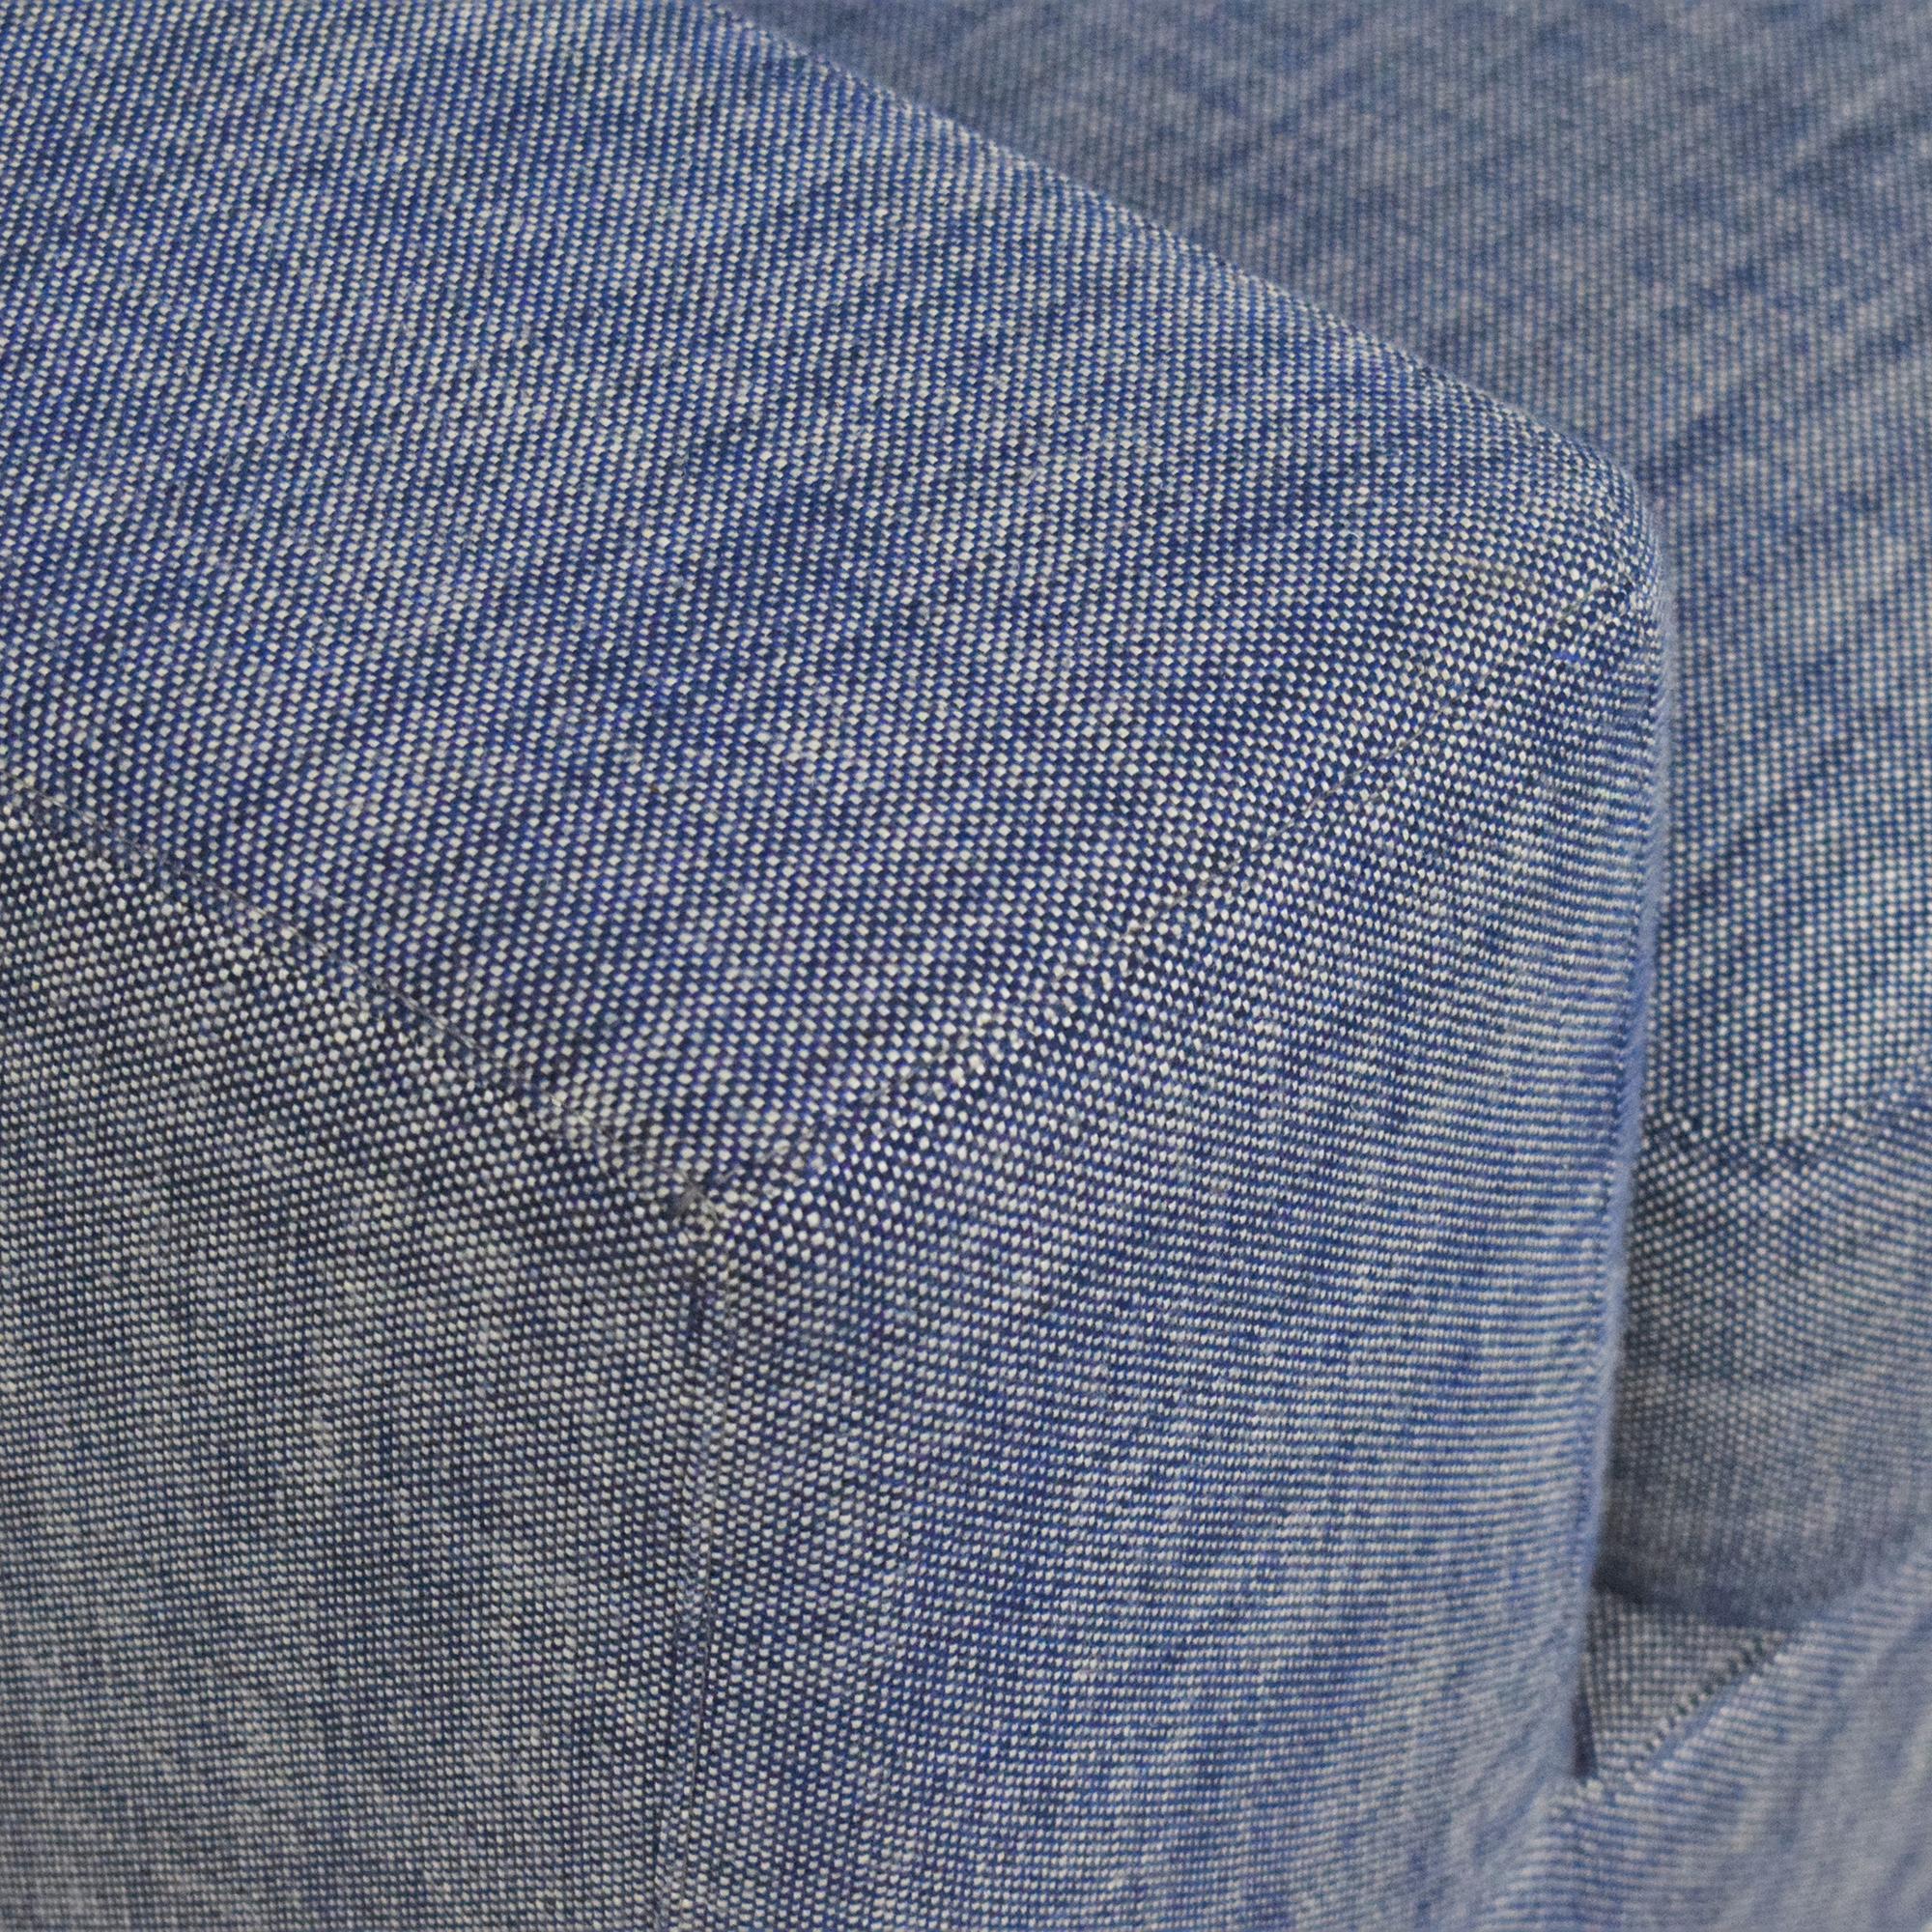 Restoration Hardware Modena Track Arm Bench-Seat Sofa sale